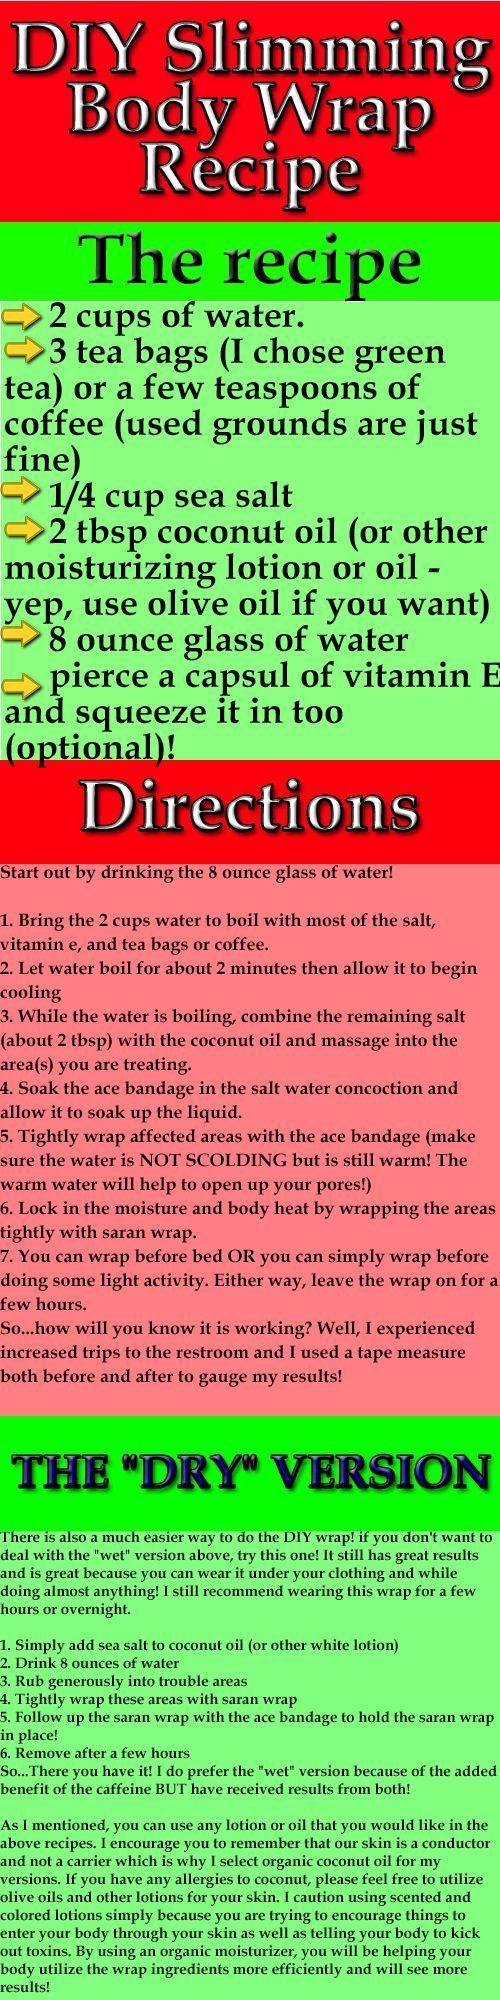 DIY Slimming Body Wrap Recipe | Green, Body wraps and ...